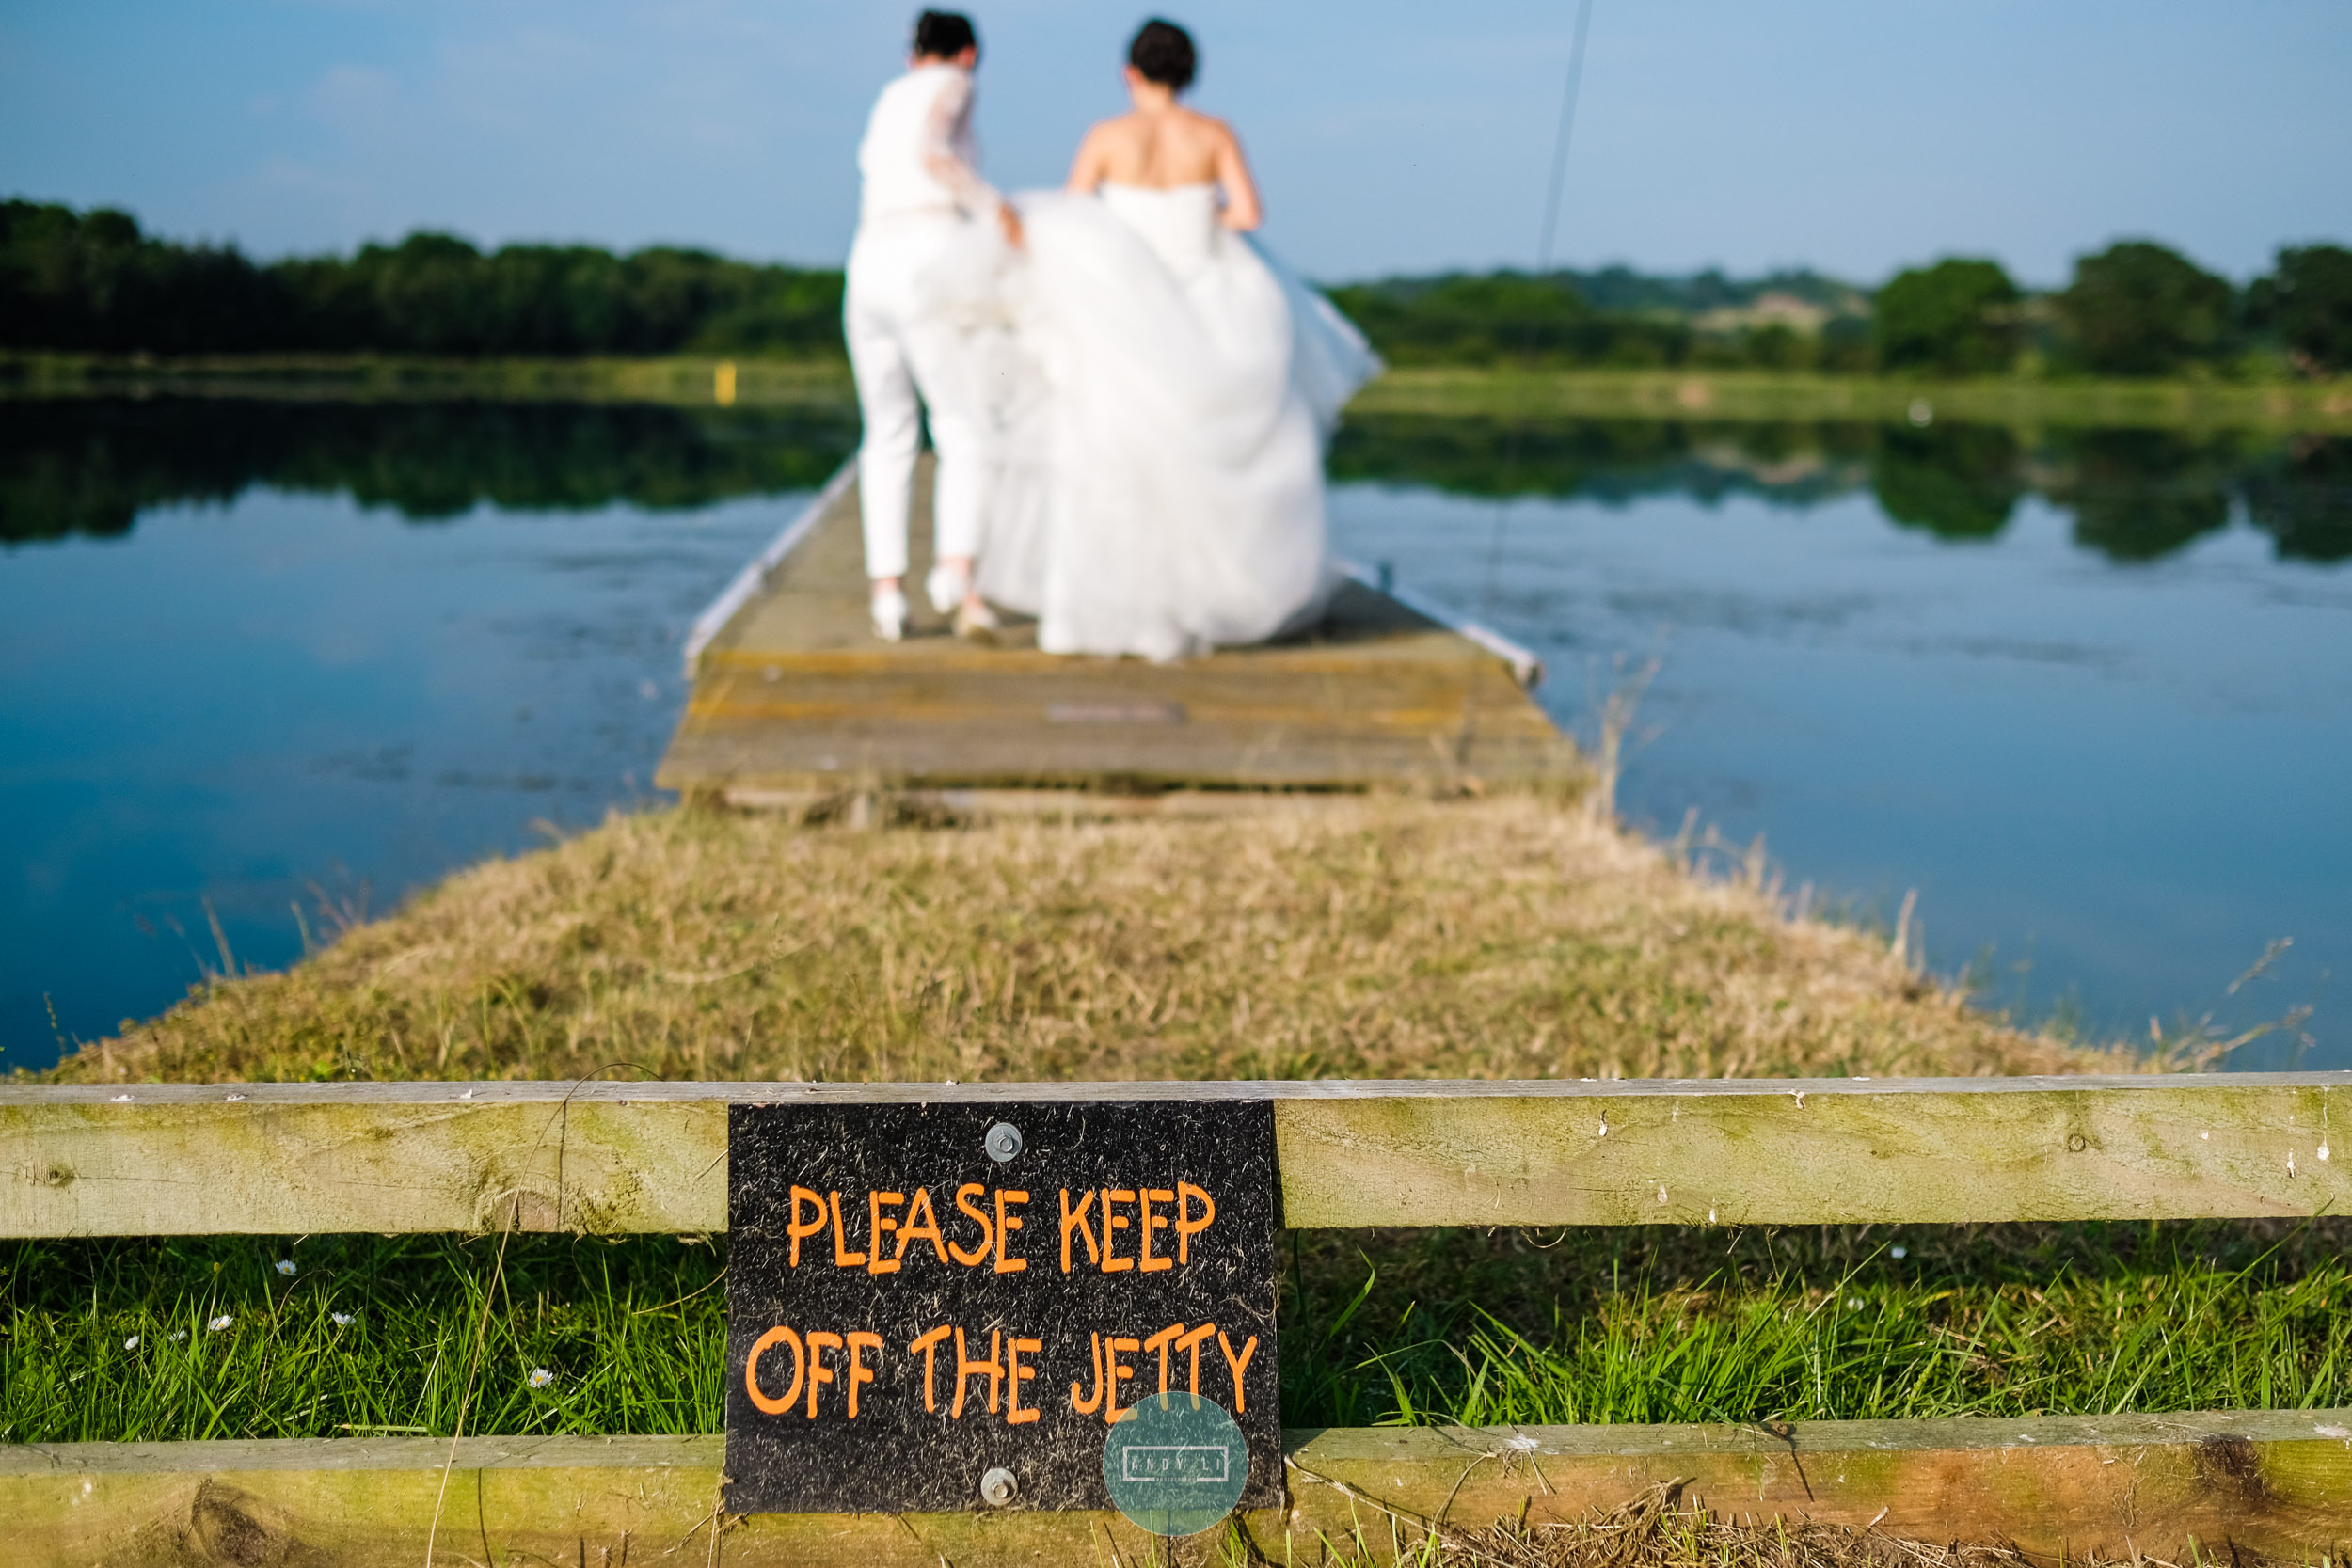 Manley Mere Cheshire Wedding Photographer-009-AXT21064.jpg